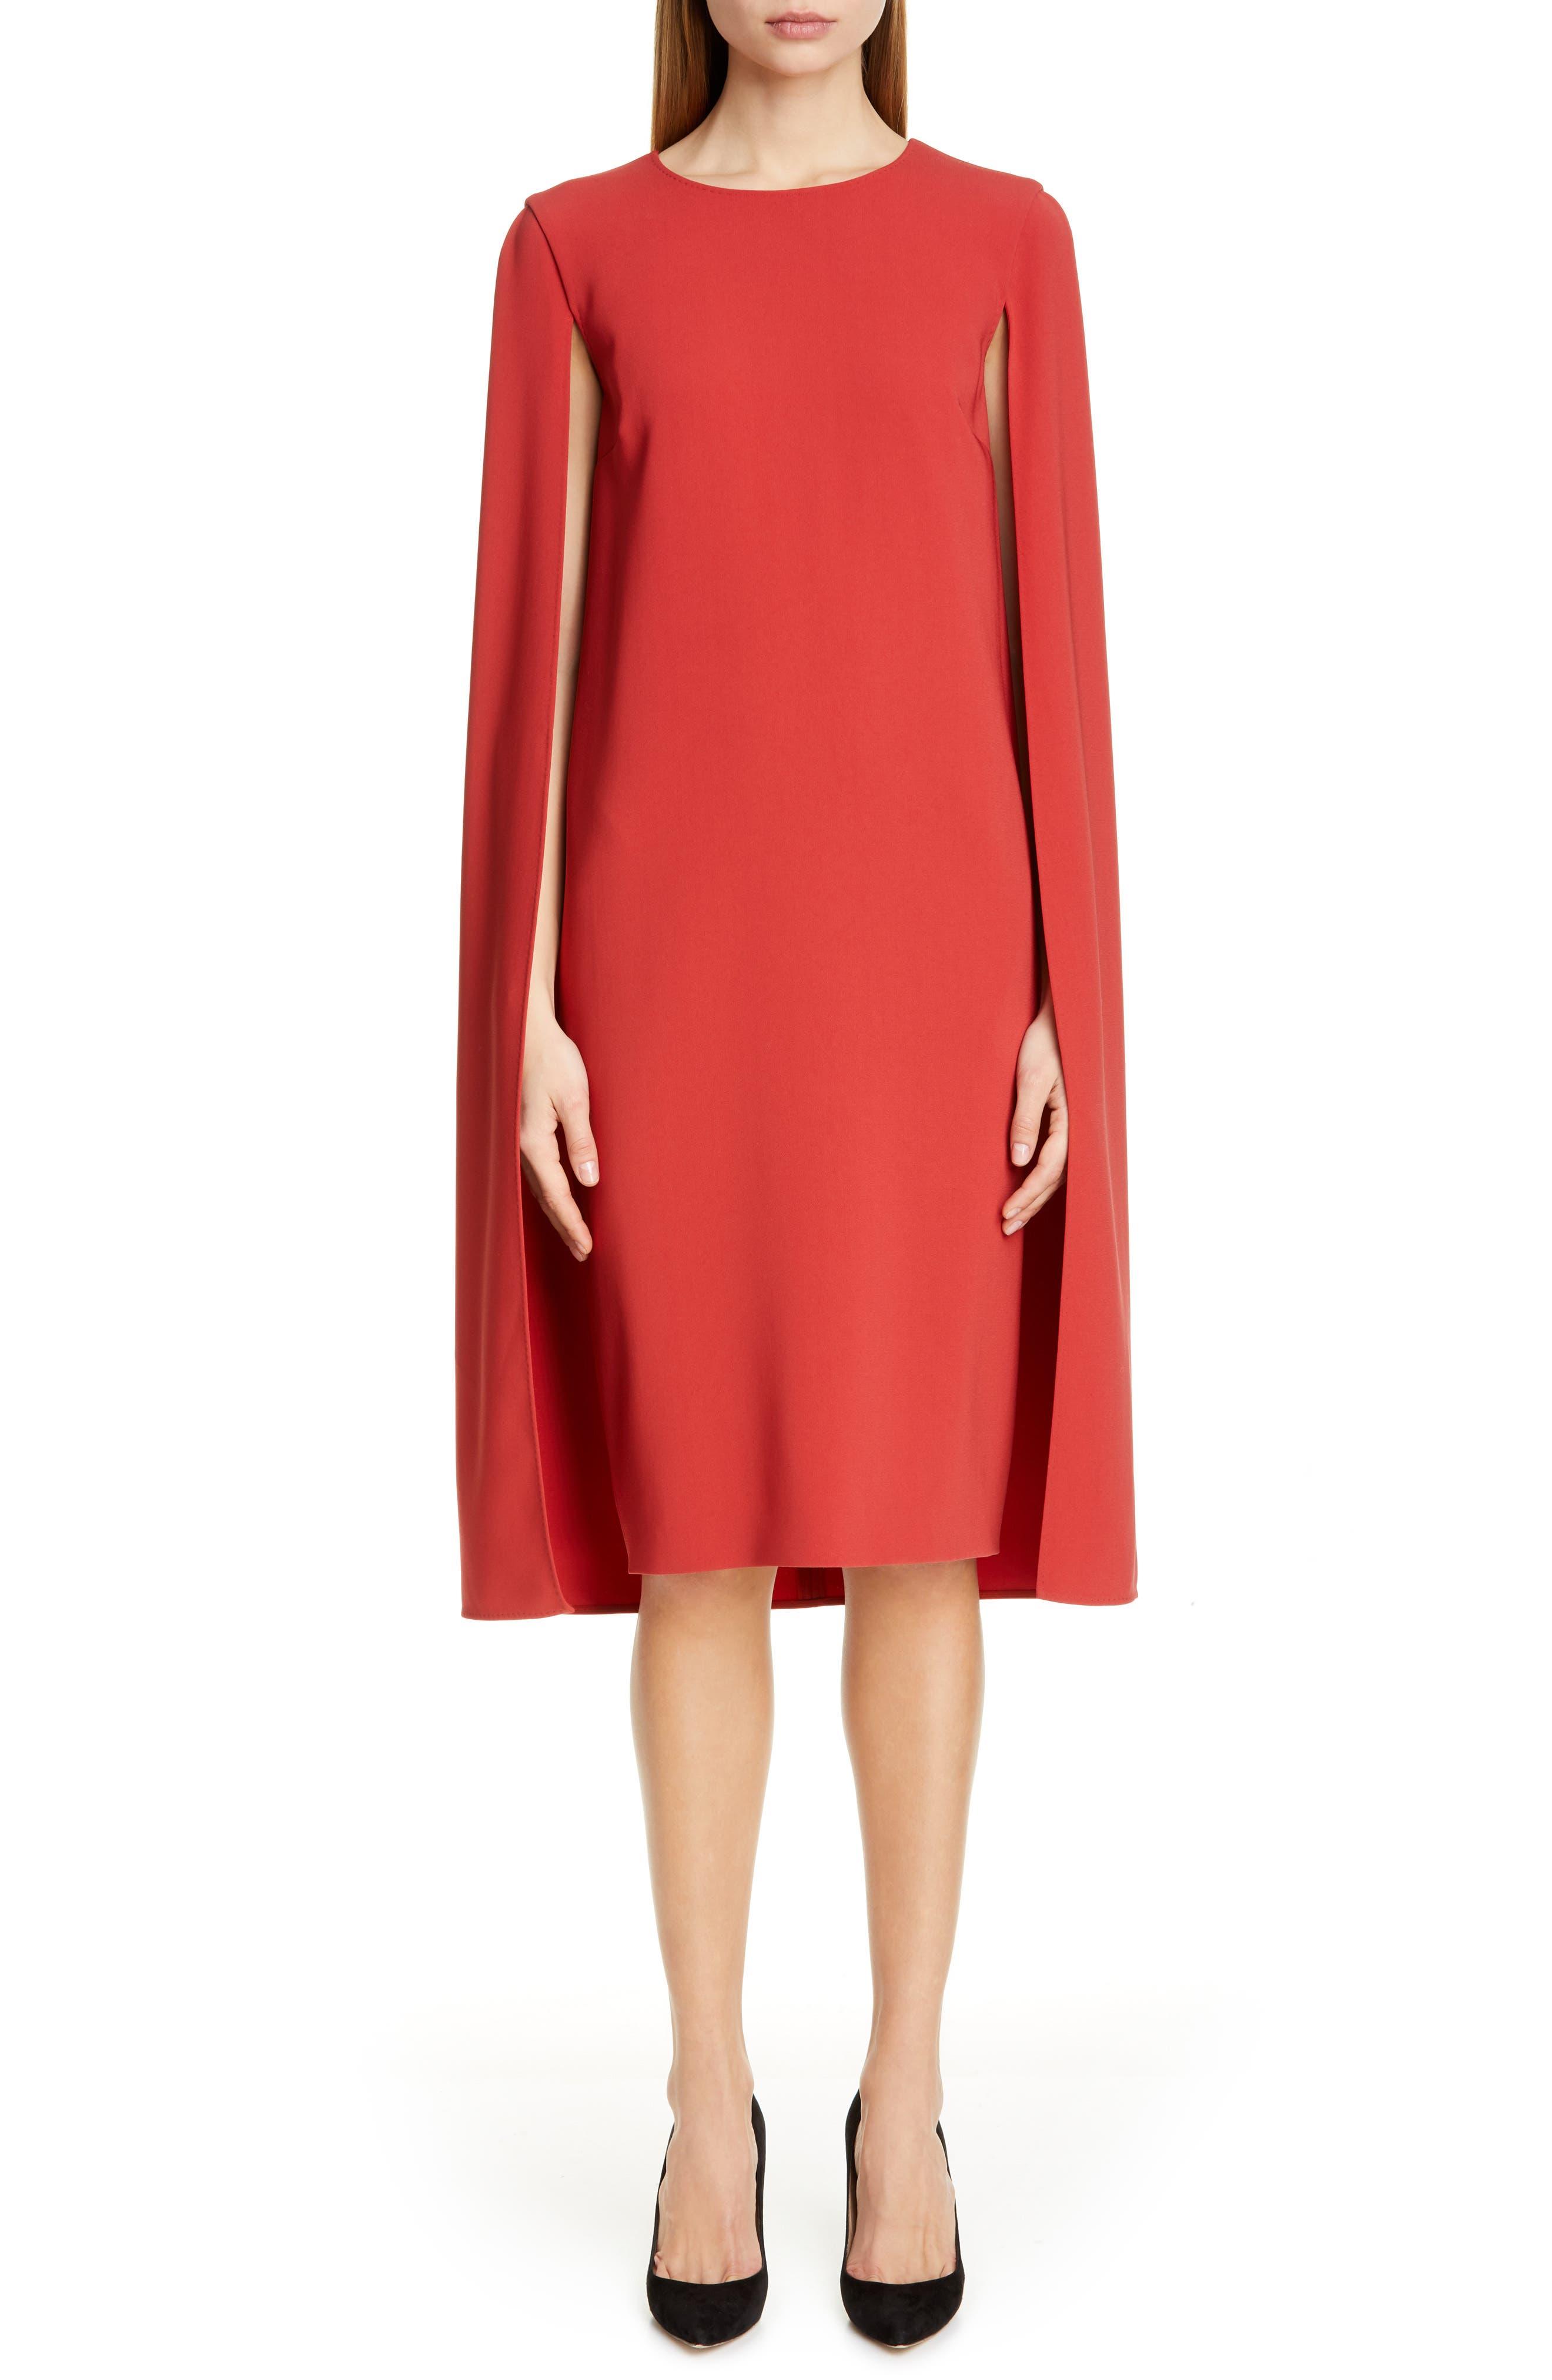 Max Mara Sansone Cape Shift Dress, Red